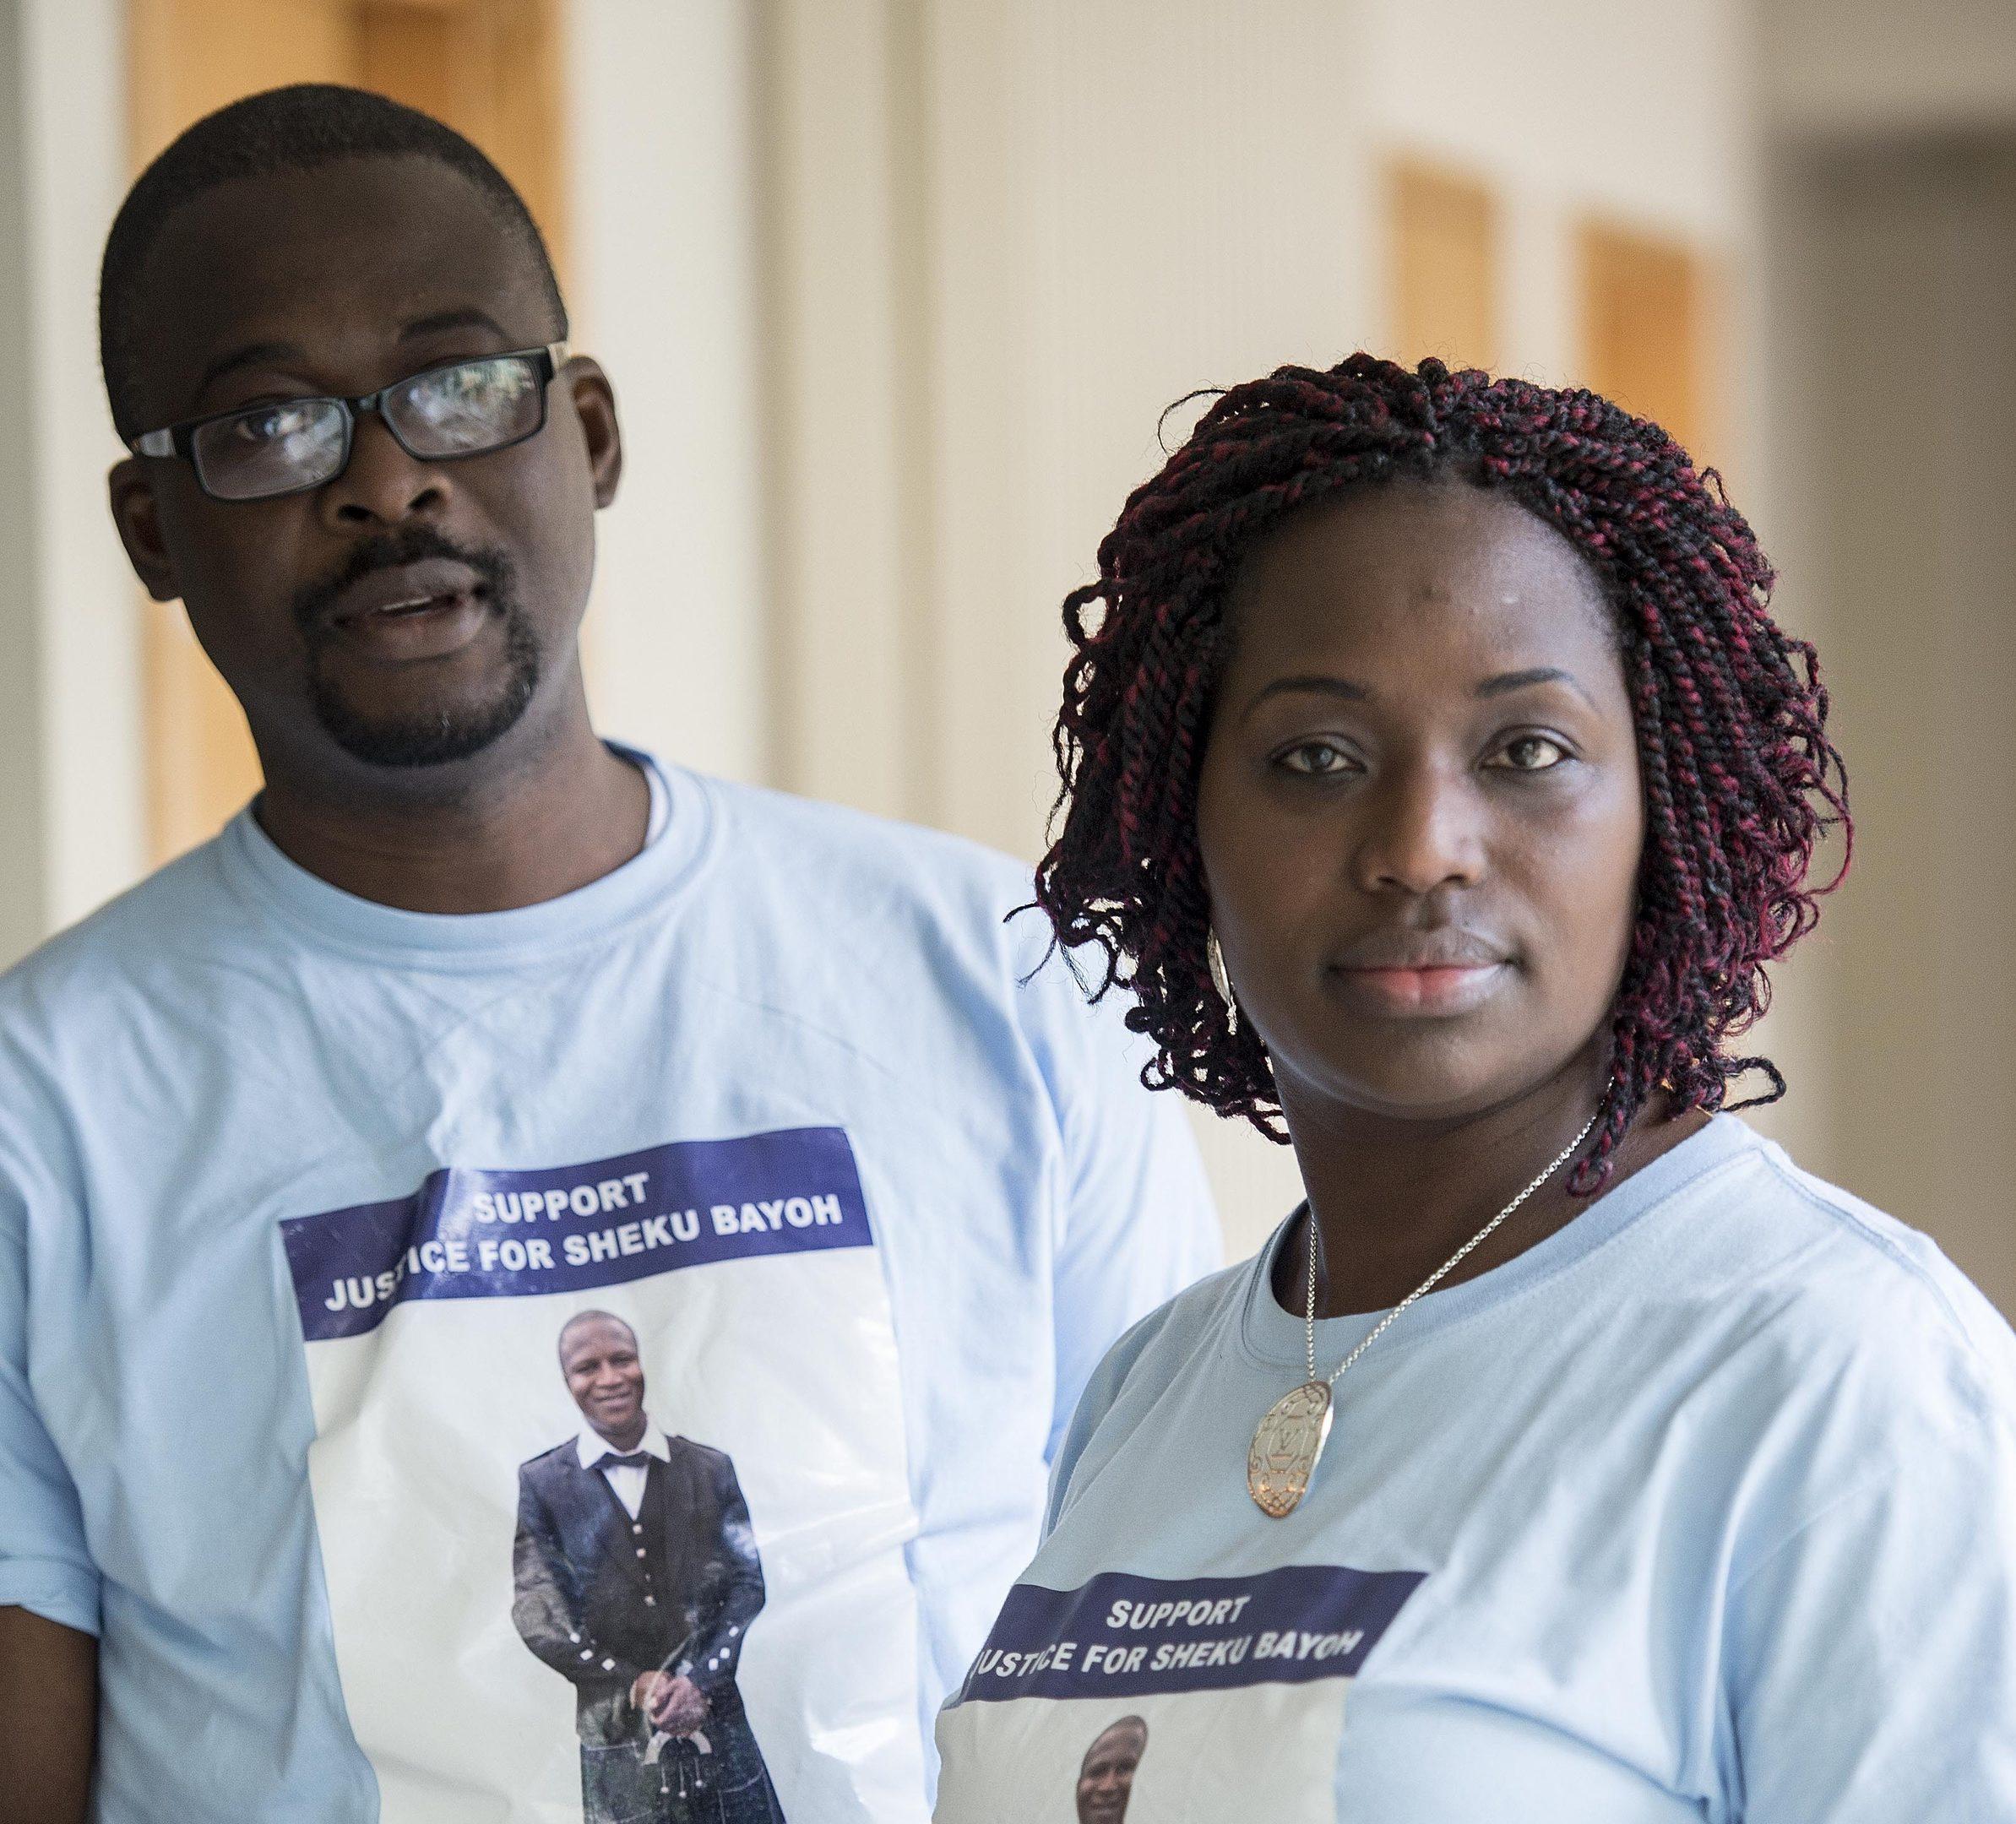 Family members Adeyemi Johnson (Brother in Law) and Kadijata Bayoh (sister) (Wattie Cheung)